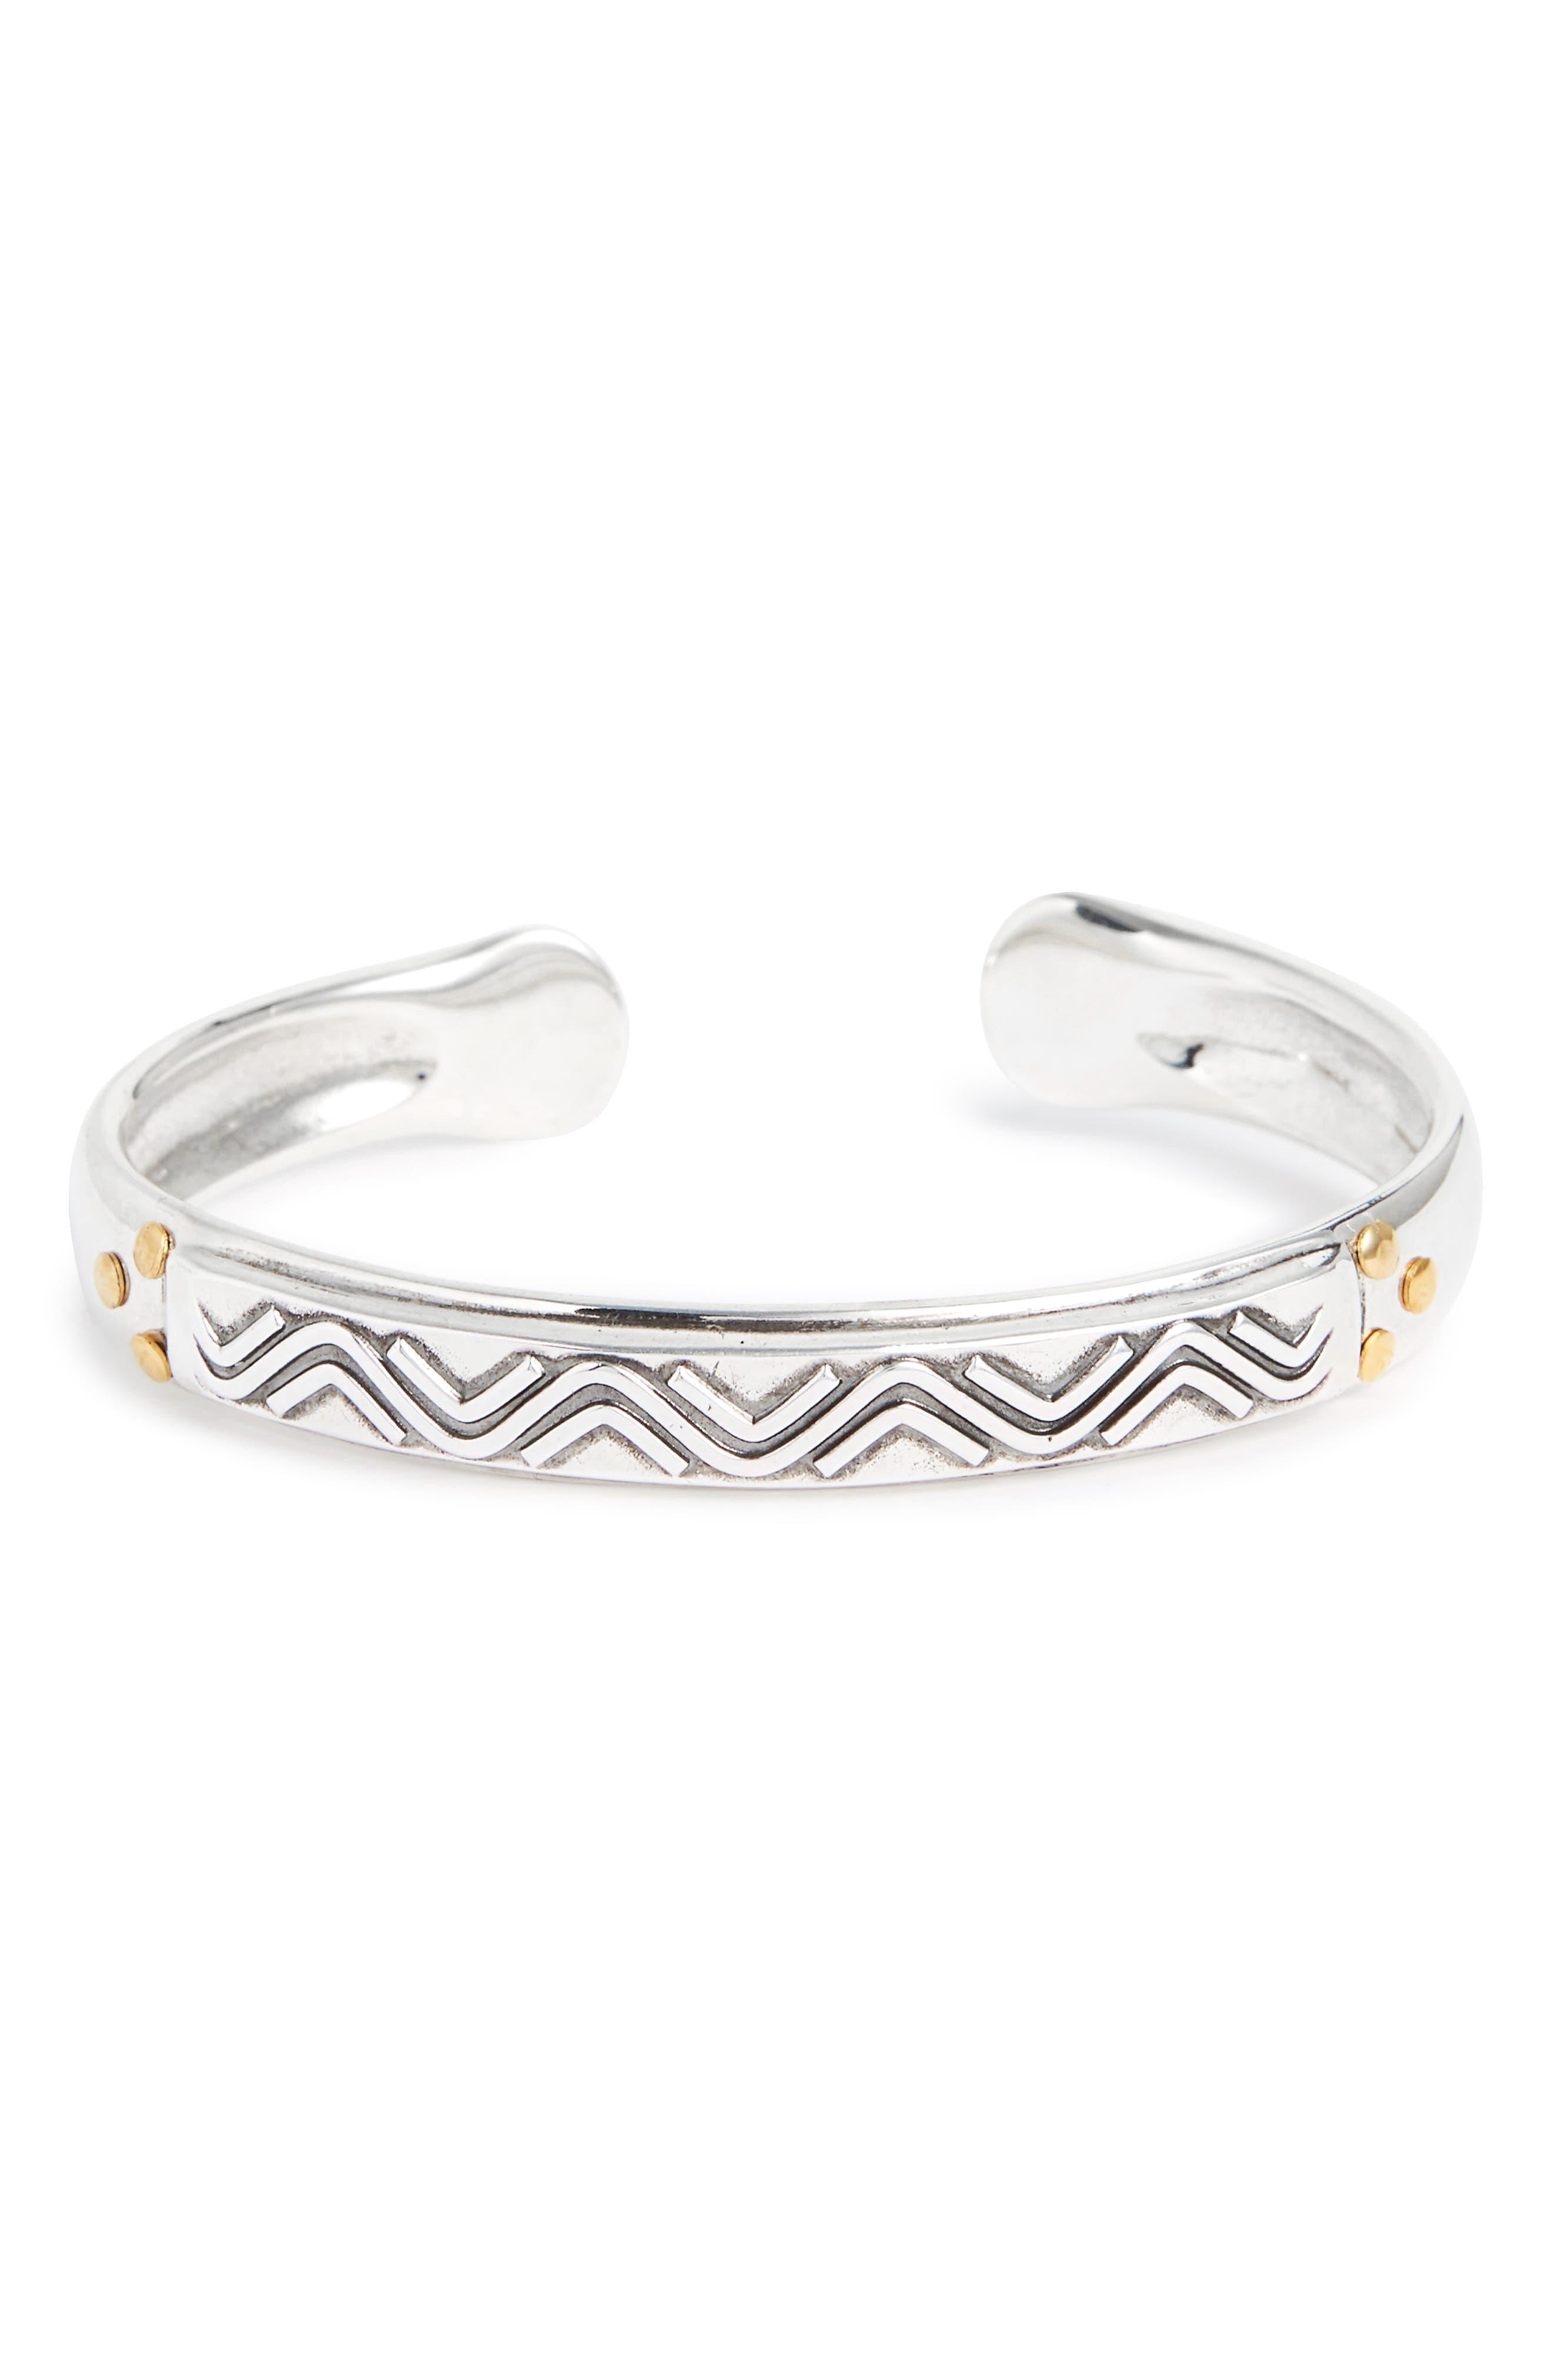 Matis Cuff Bracelet,                             Main thumbnail 1, color,                             Silver